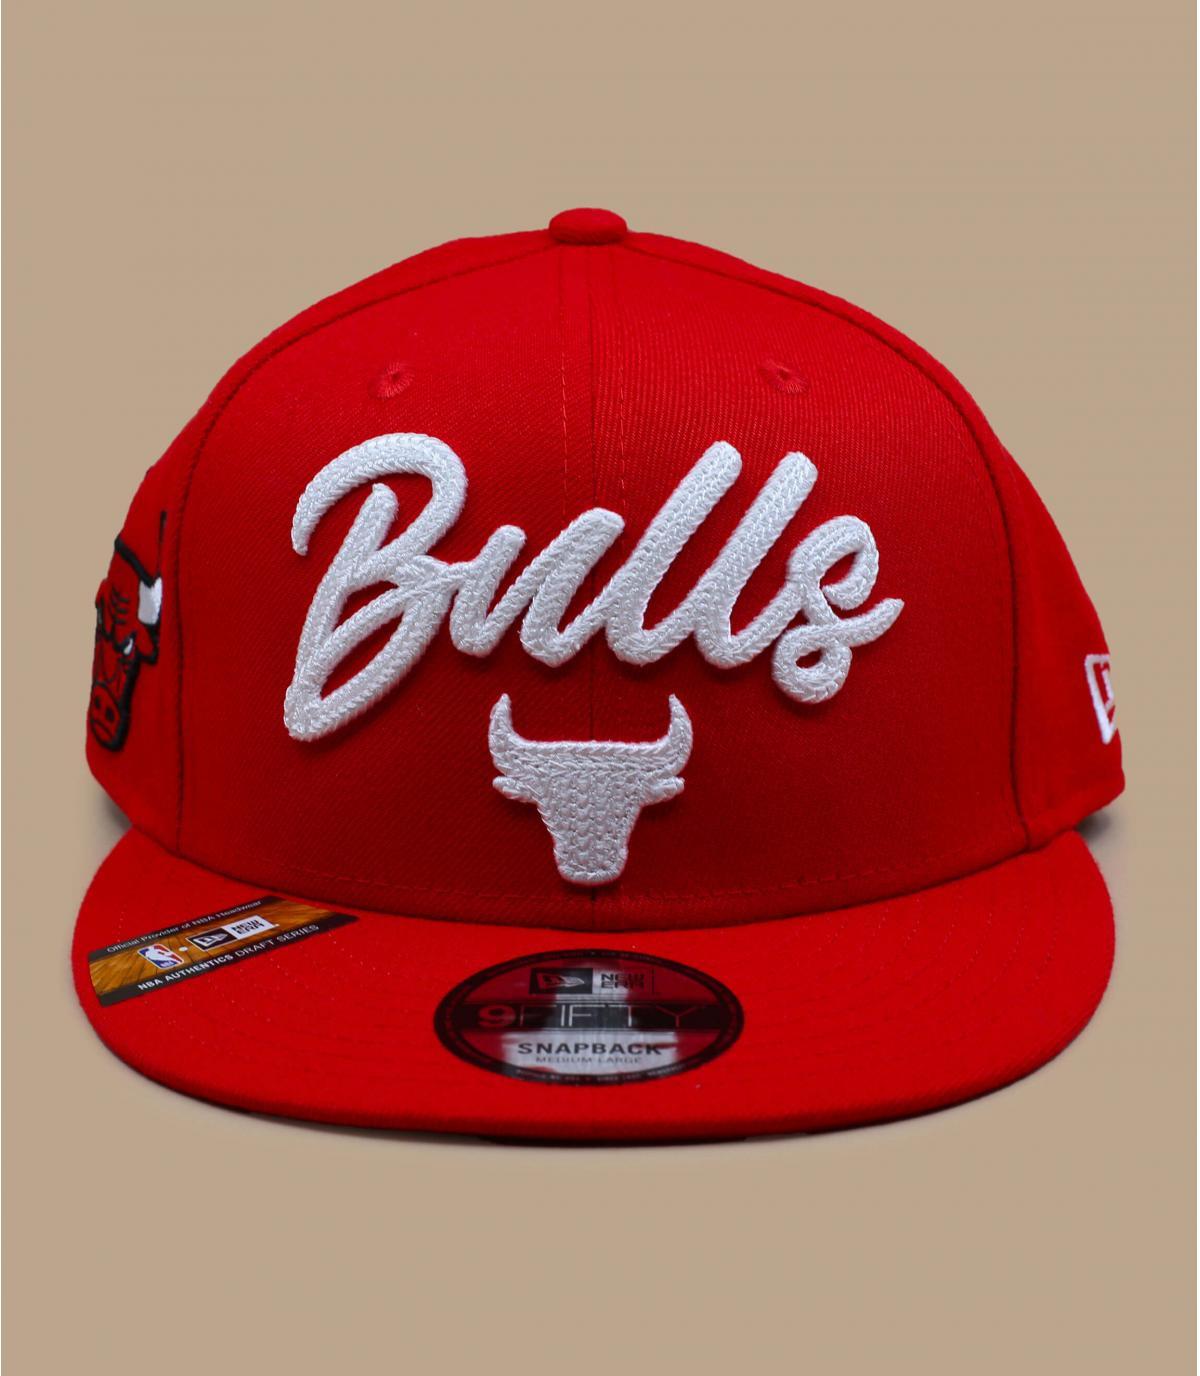 Details Snapback NBA Draft Bulls 950 - afbeeling 2